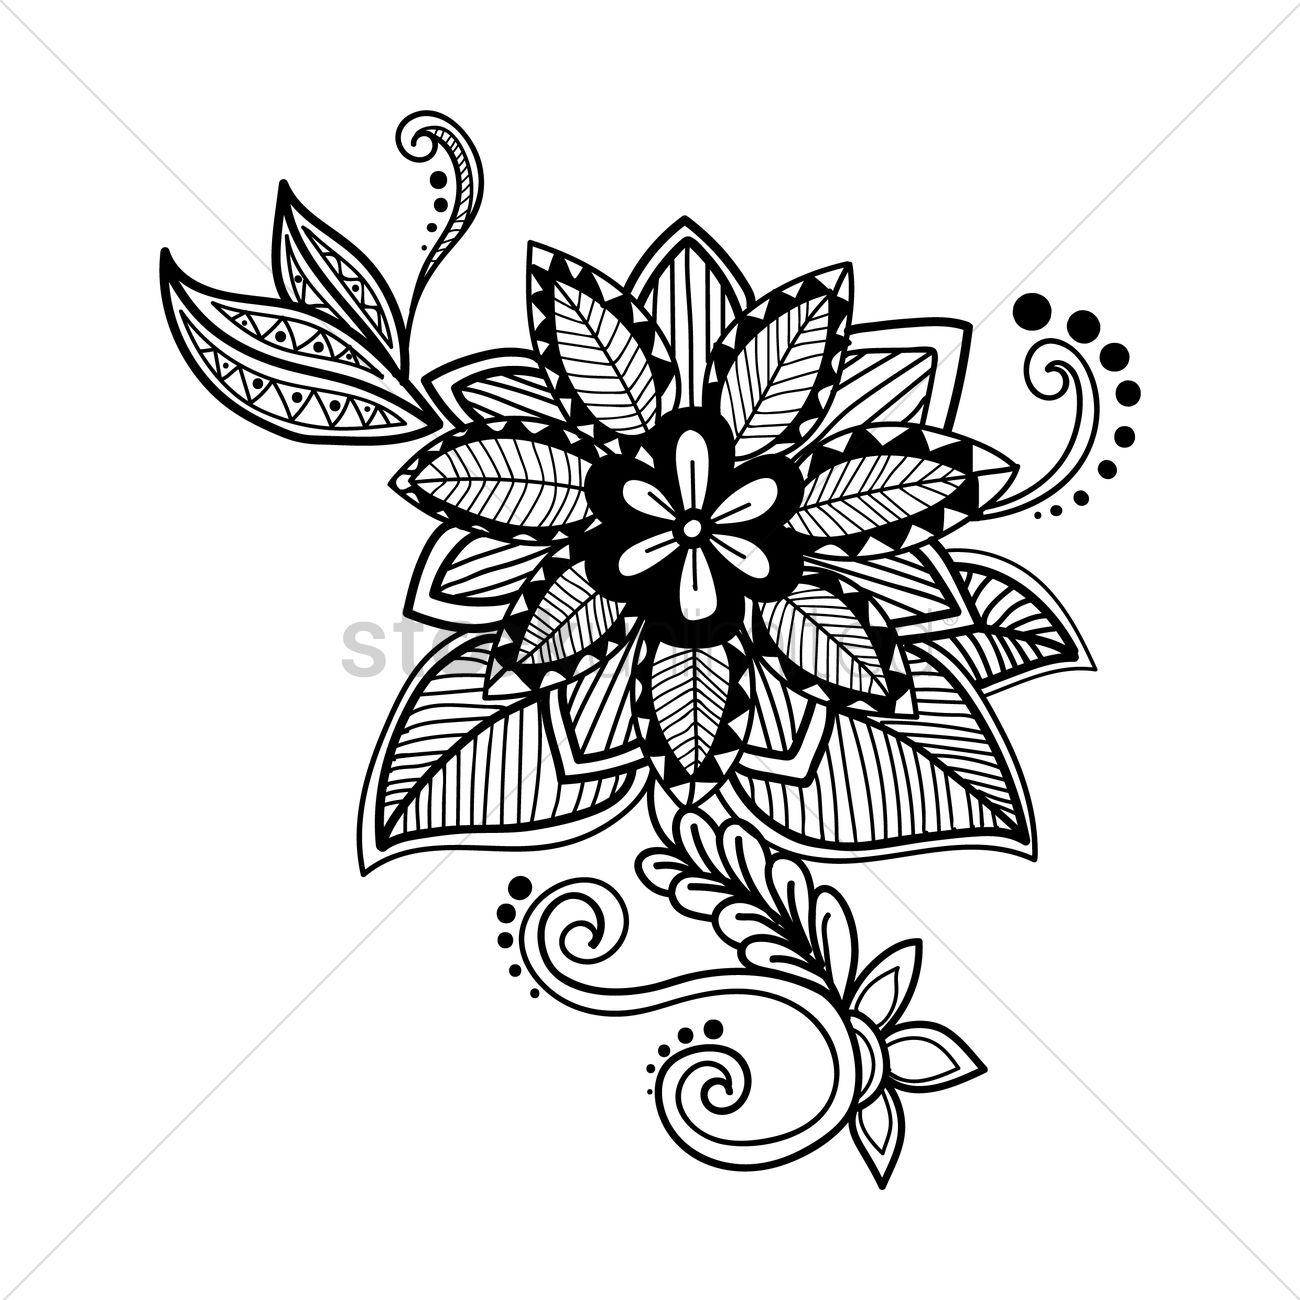 1300x1300 Decorative Flower Design Vector Image